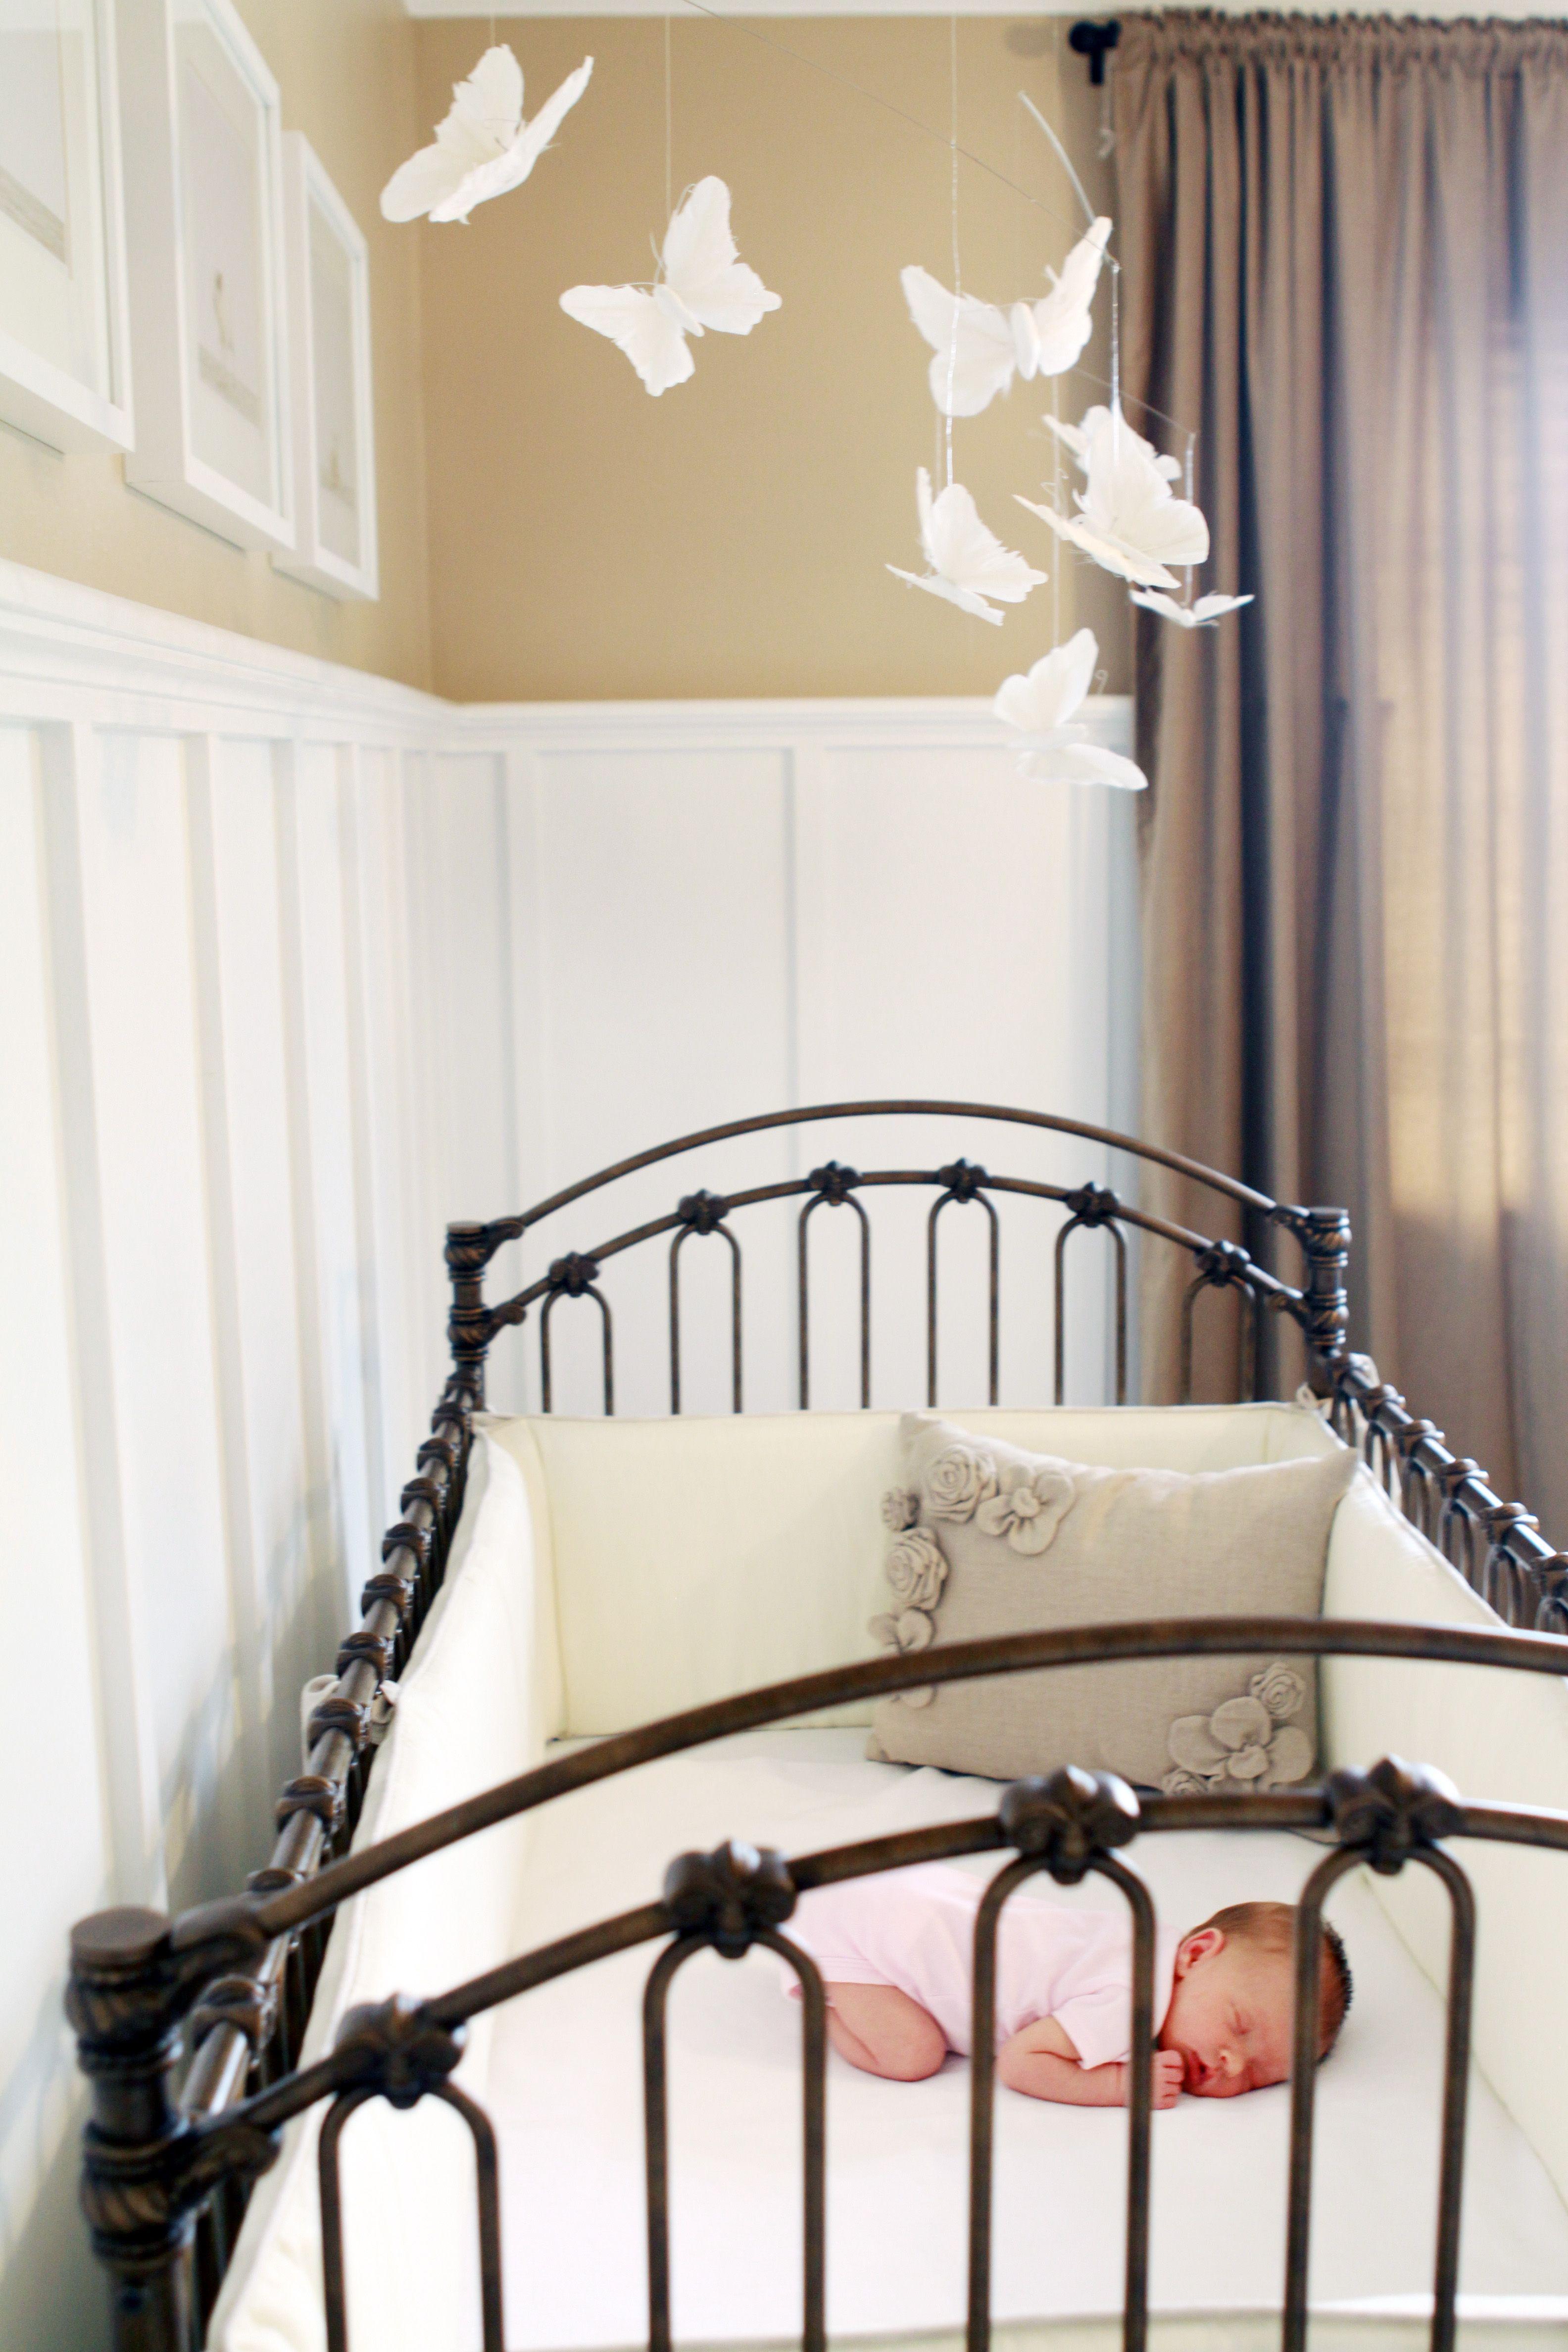 Baby S Crib Burlington 300 Baby Furniture Sets Baby Furniture Nursery Room Decor